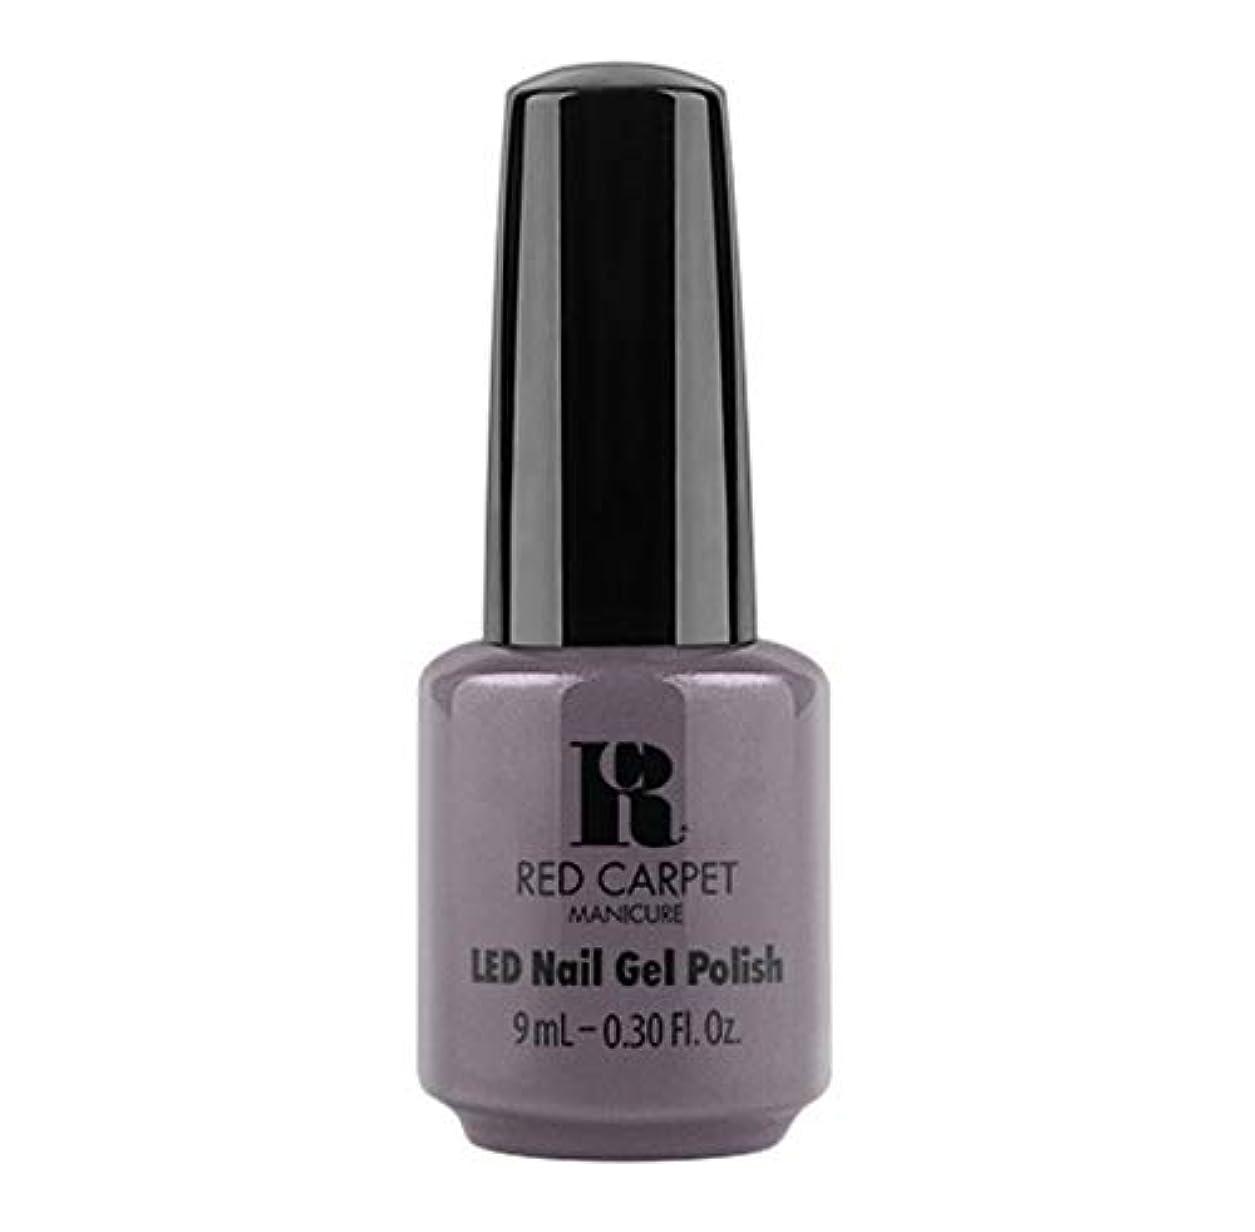 顔料瞑想的筋Red Carpet Manicure - LED Nail Gel Polish - Grey Area - 9ml / 0.30oz